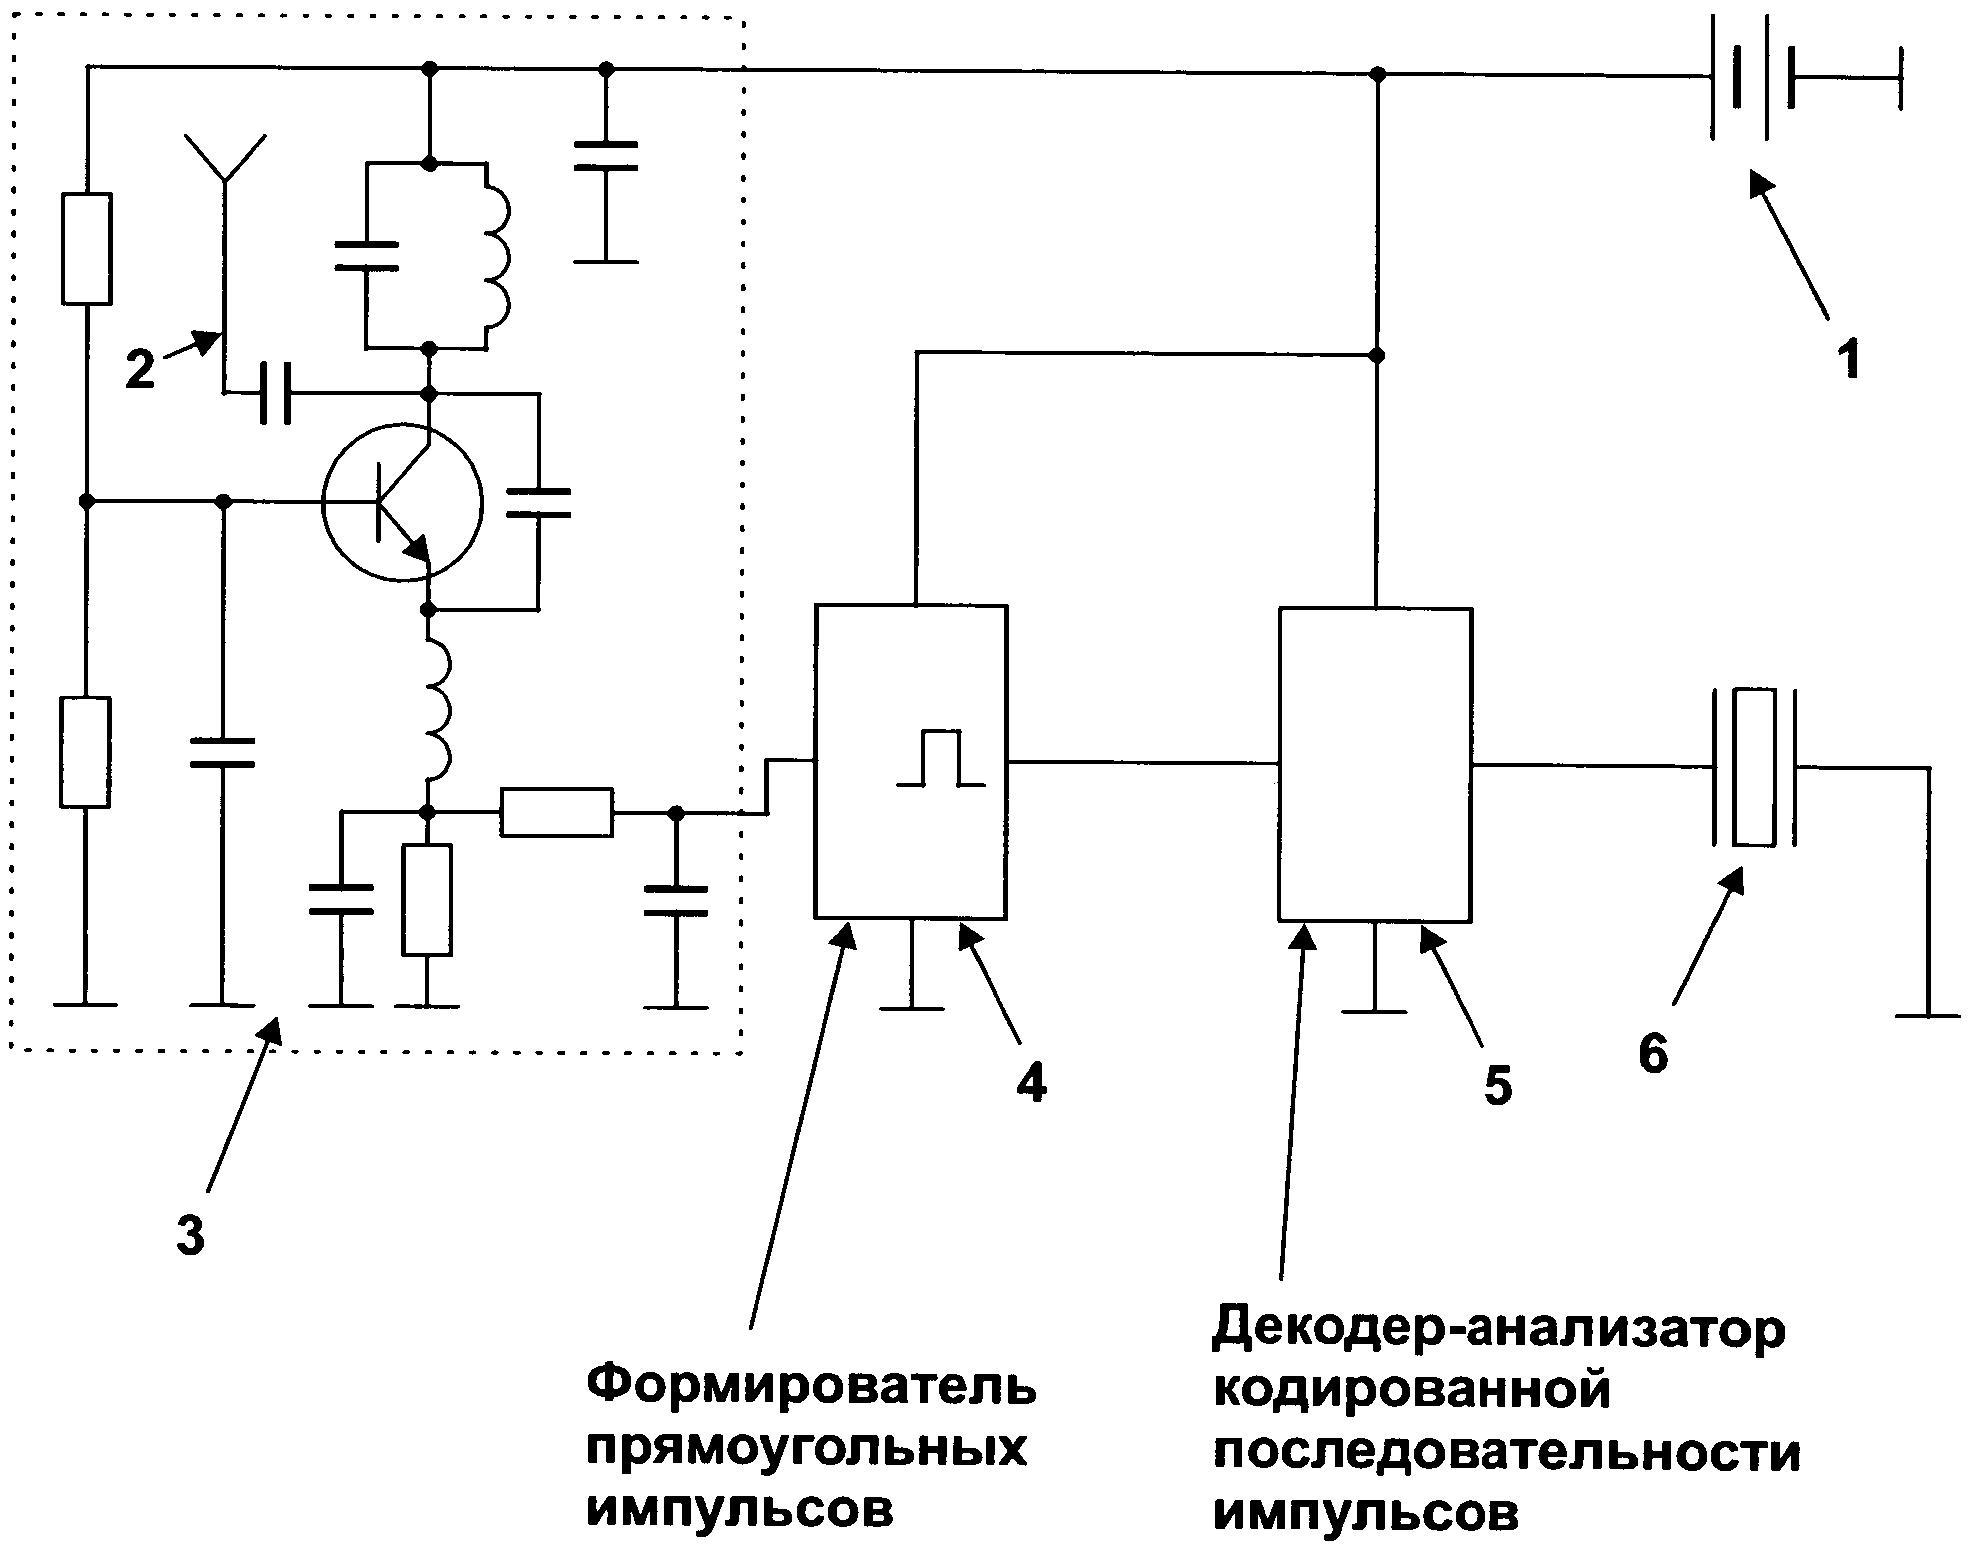 Circuit Diagram Rf Amplifier